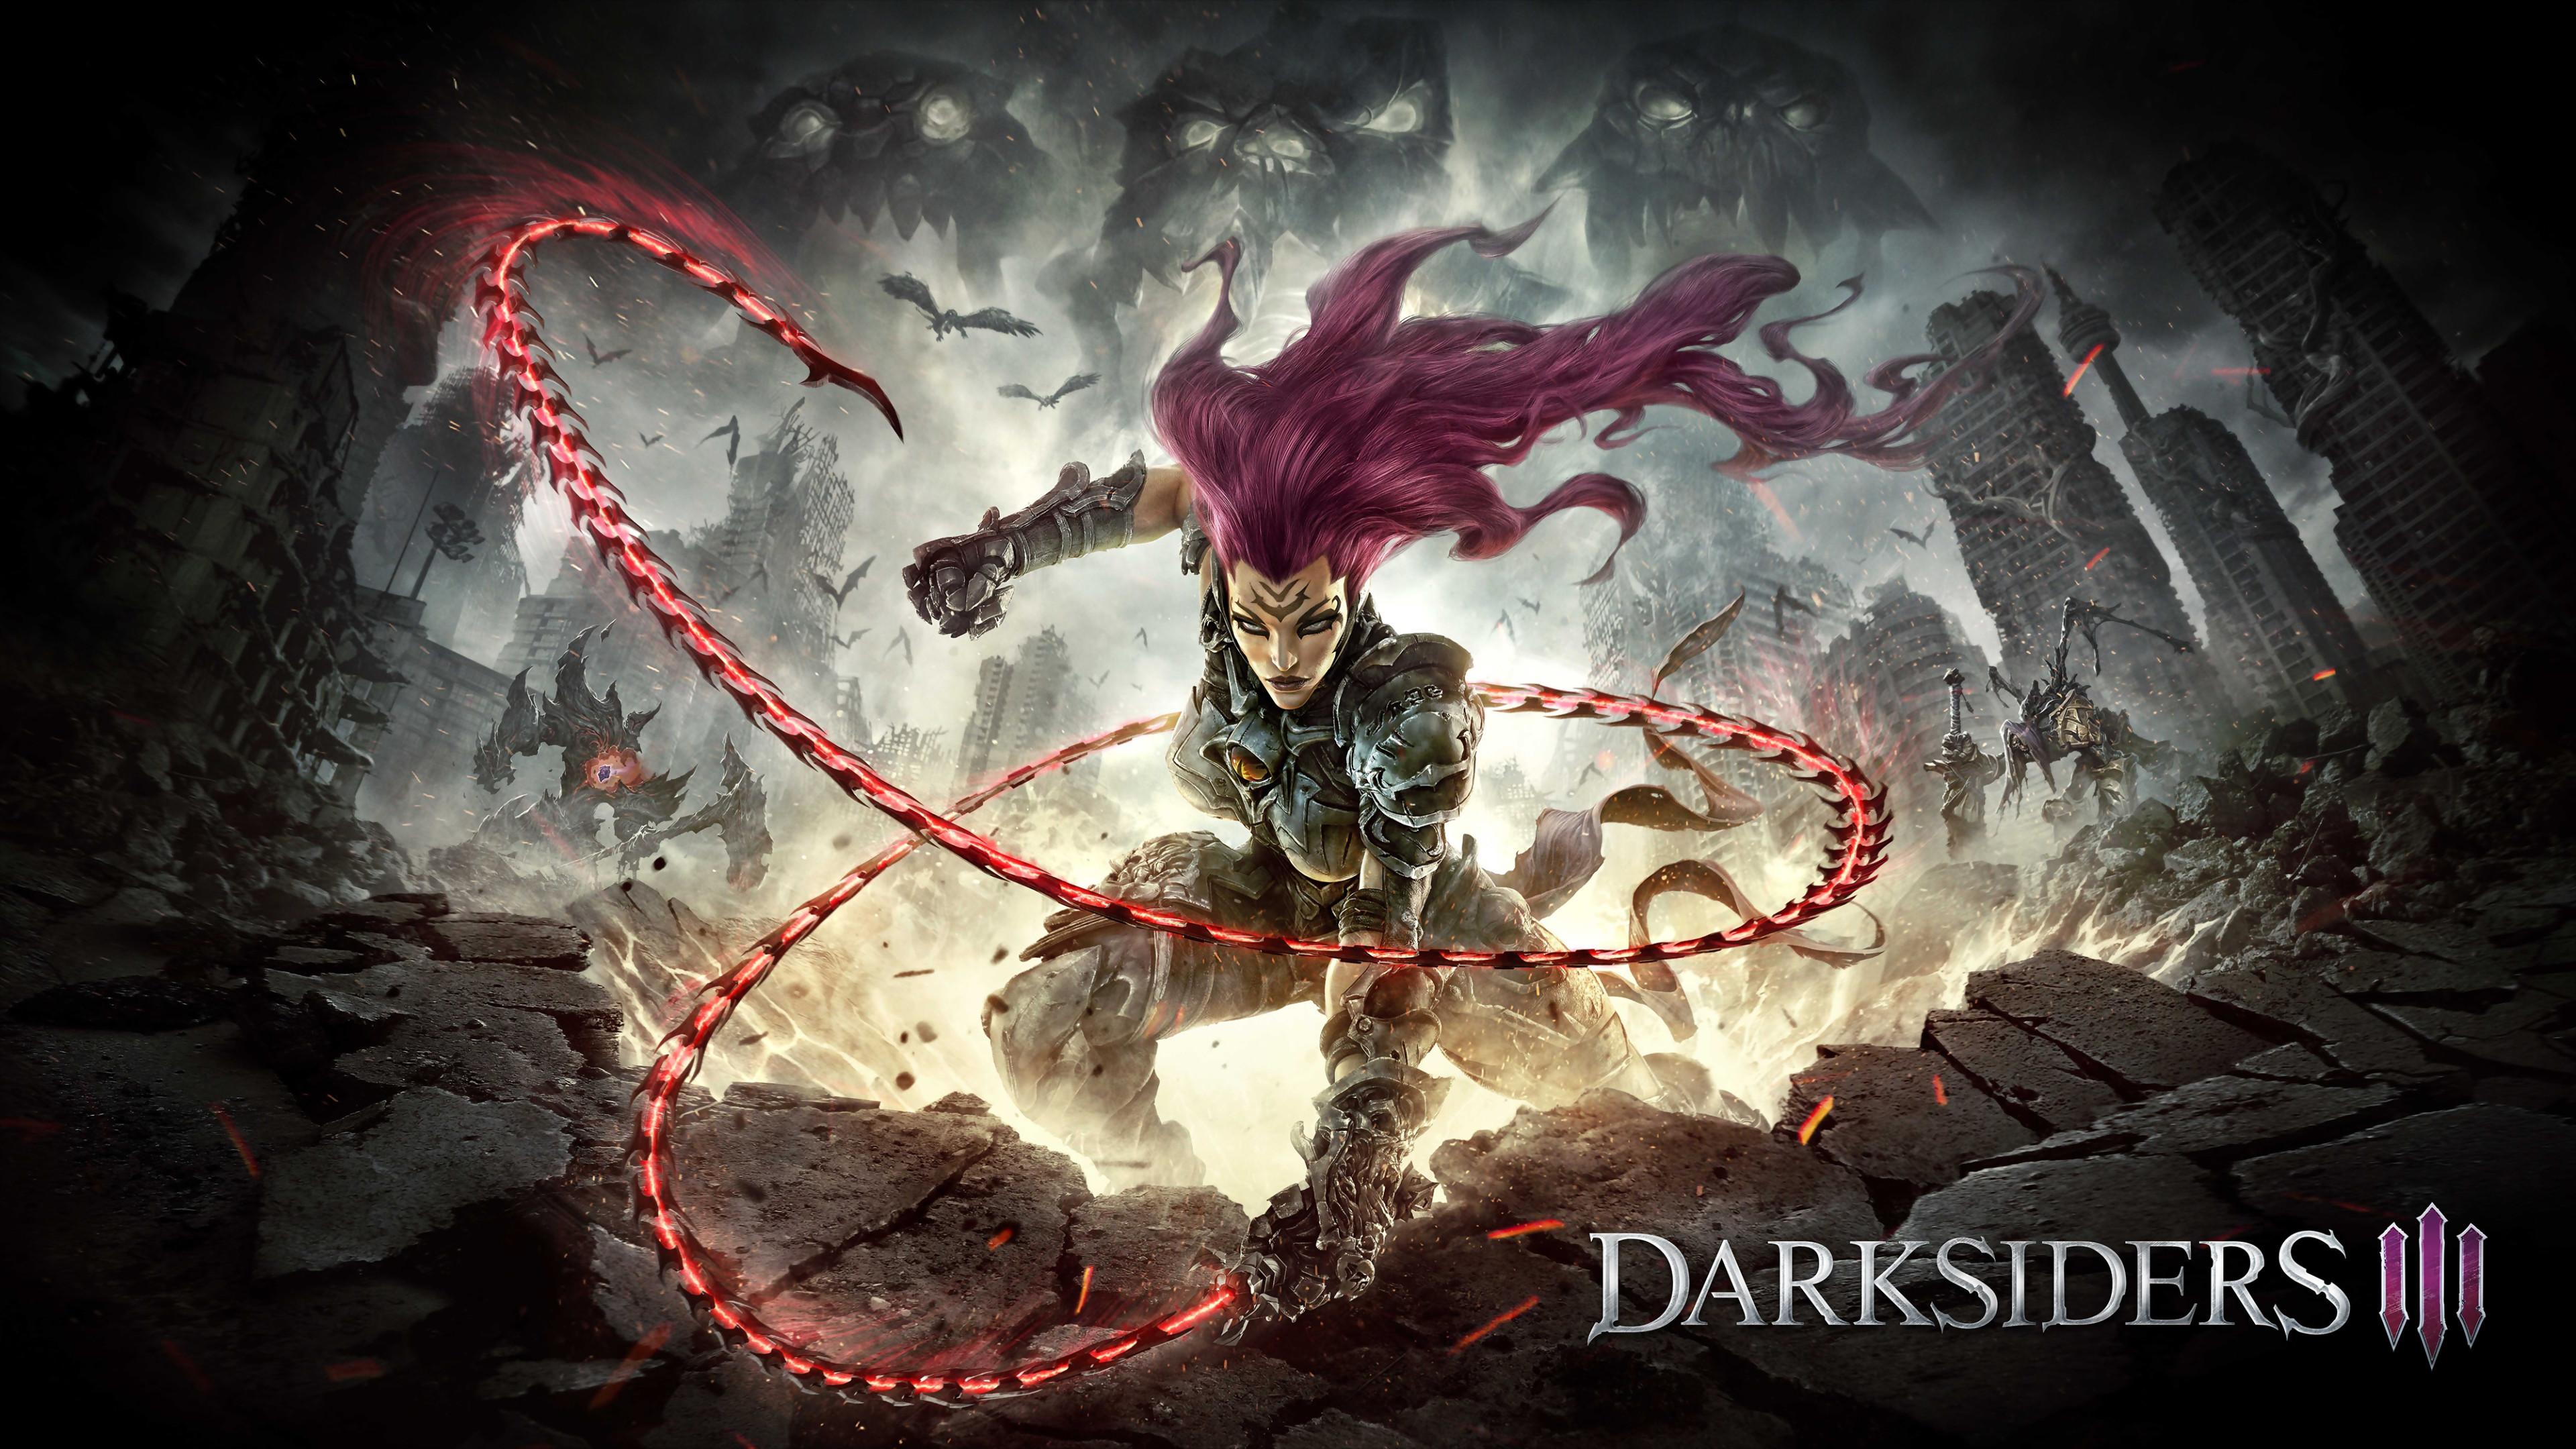 Les prochaines sorties - Page 22 Darksiders-3-artwork-59097cbd35398